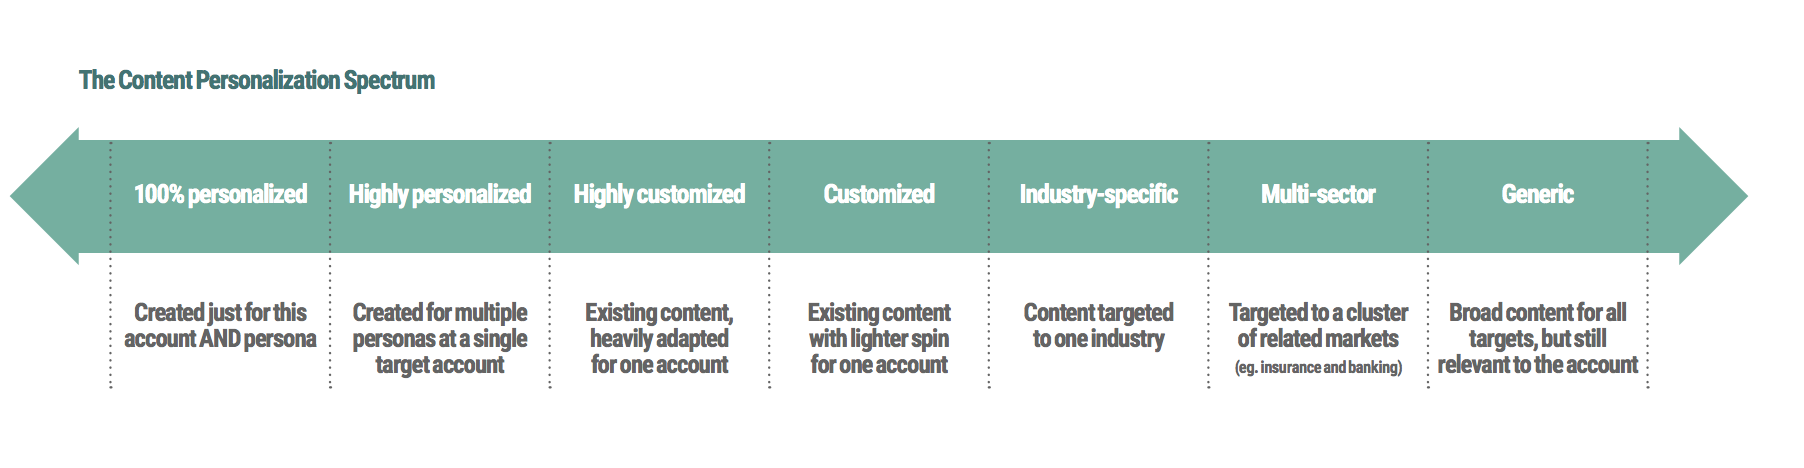 Content Personalization Spectrum for ABM